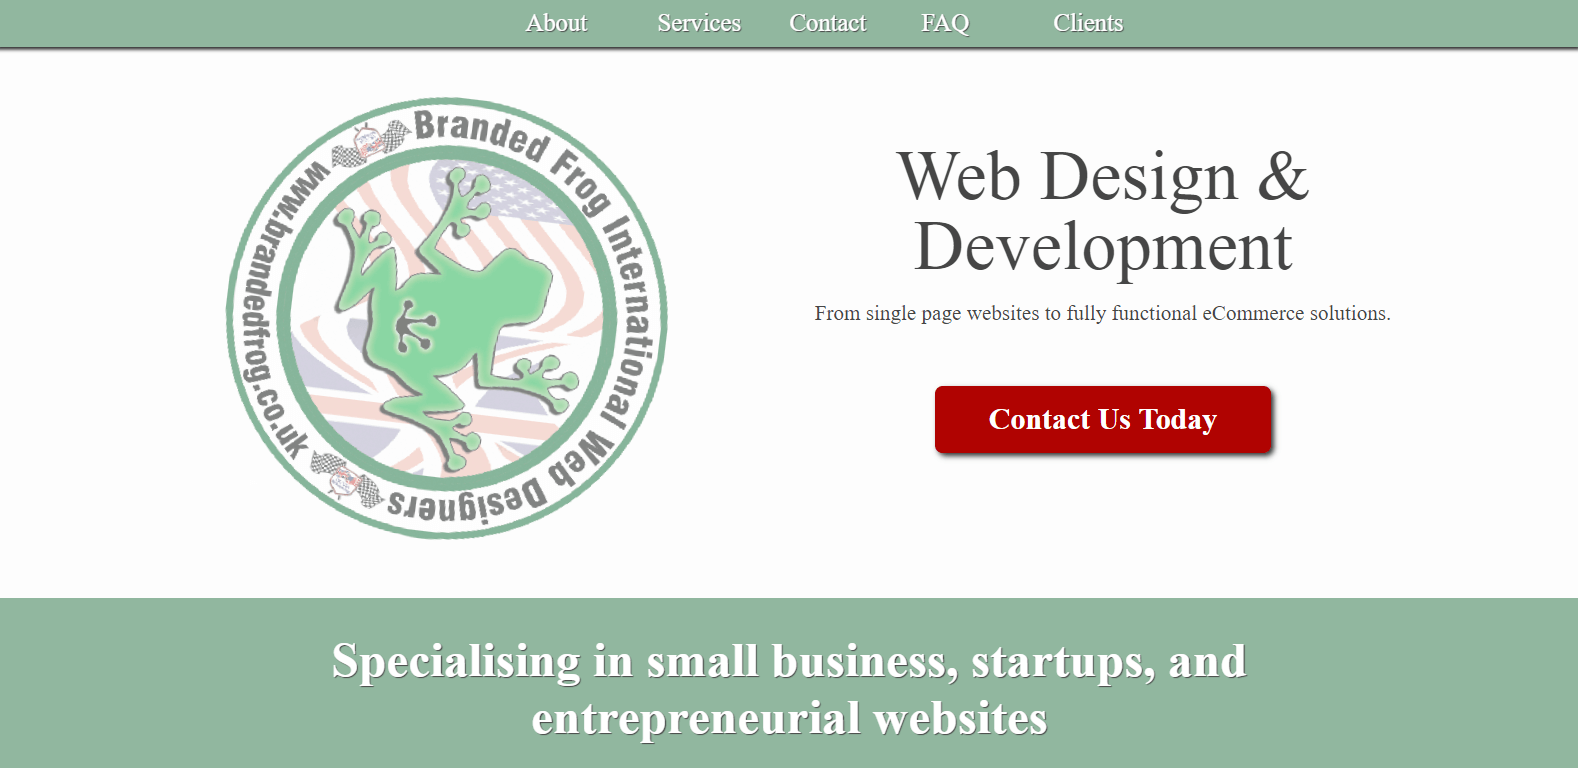 Branded Frog: Web Design - Design & Developmen